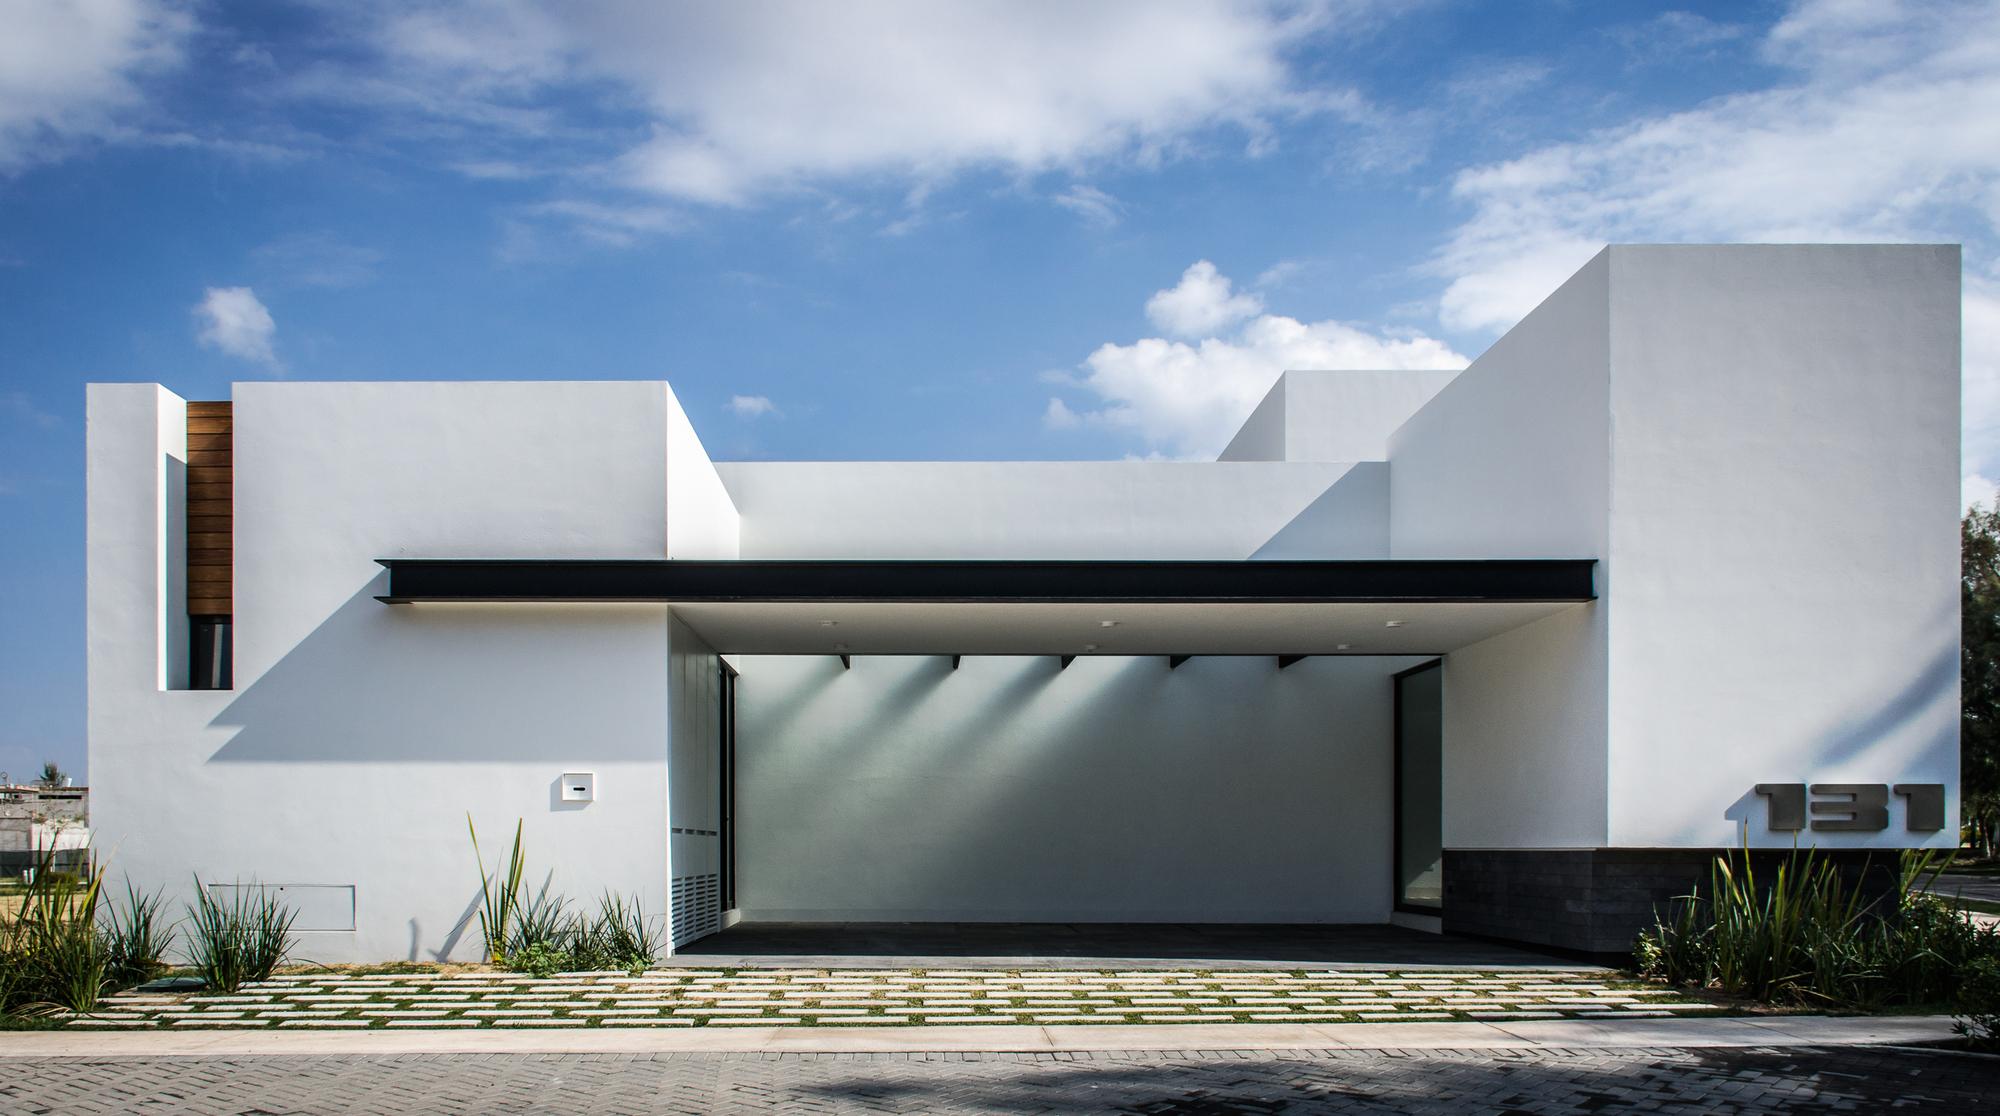 Galer a de casa agr adi arquitectura y dise o interior 2 for Arquitectura y diseno de casas